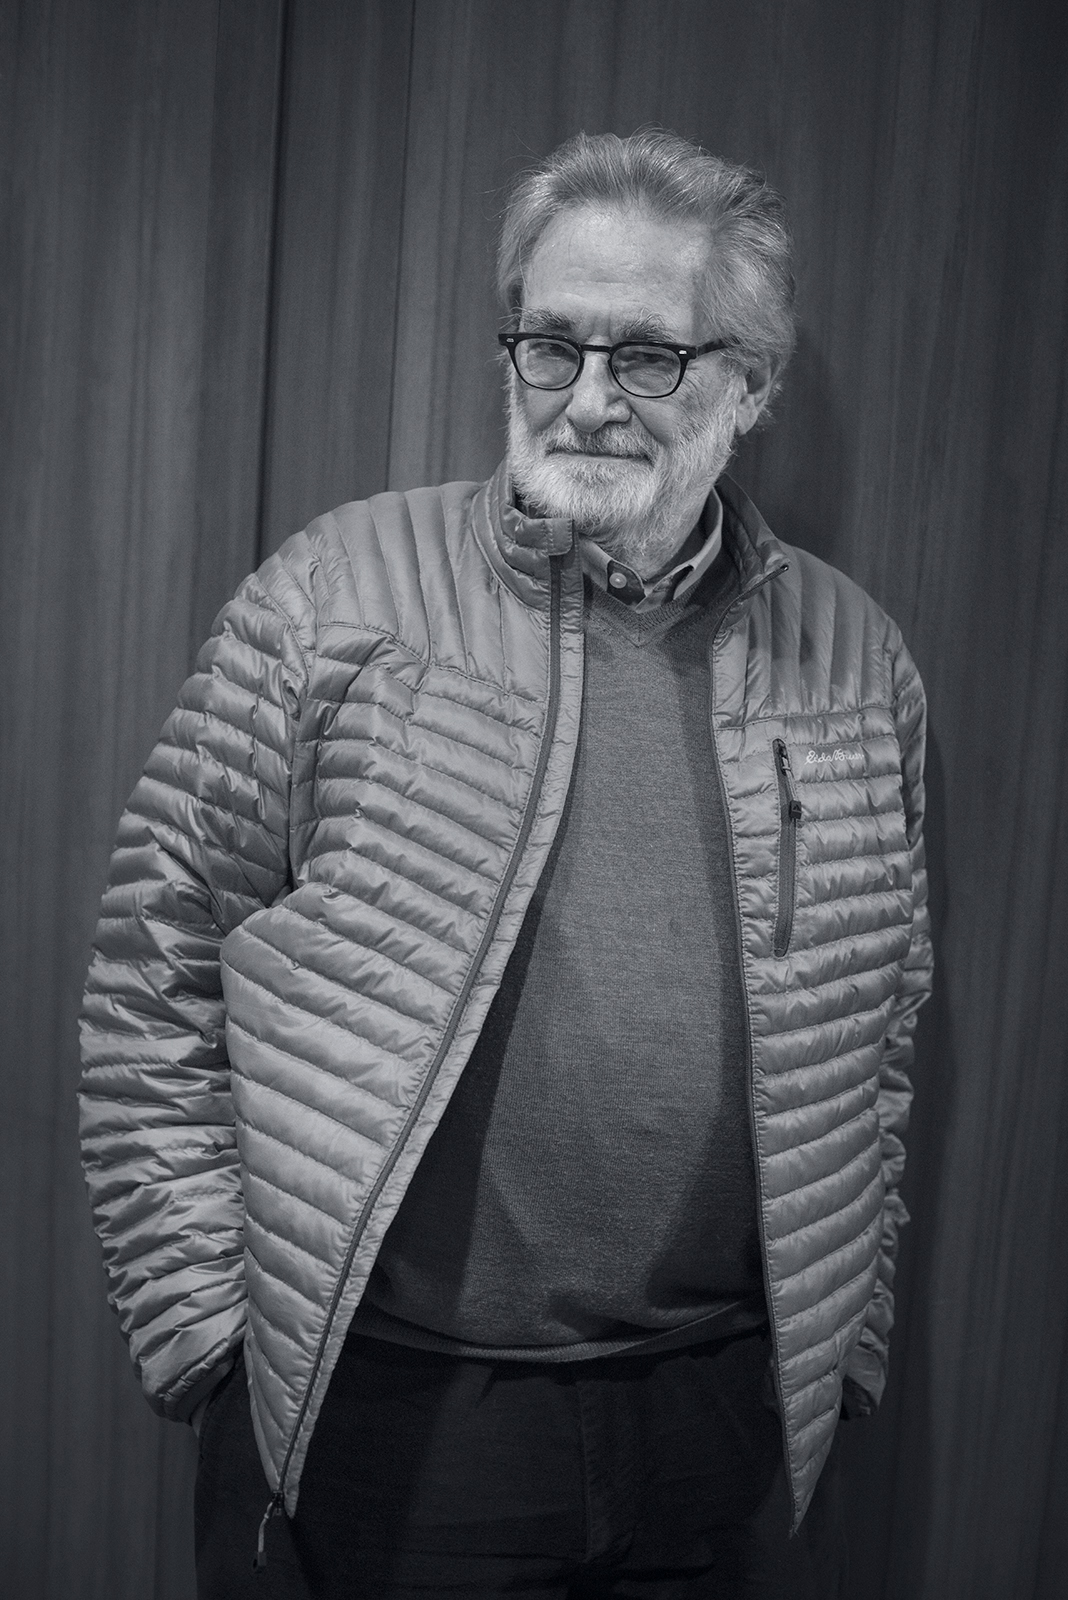 Pedro Meyer